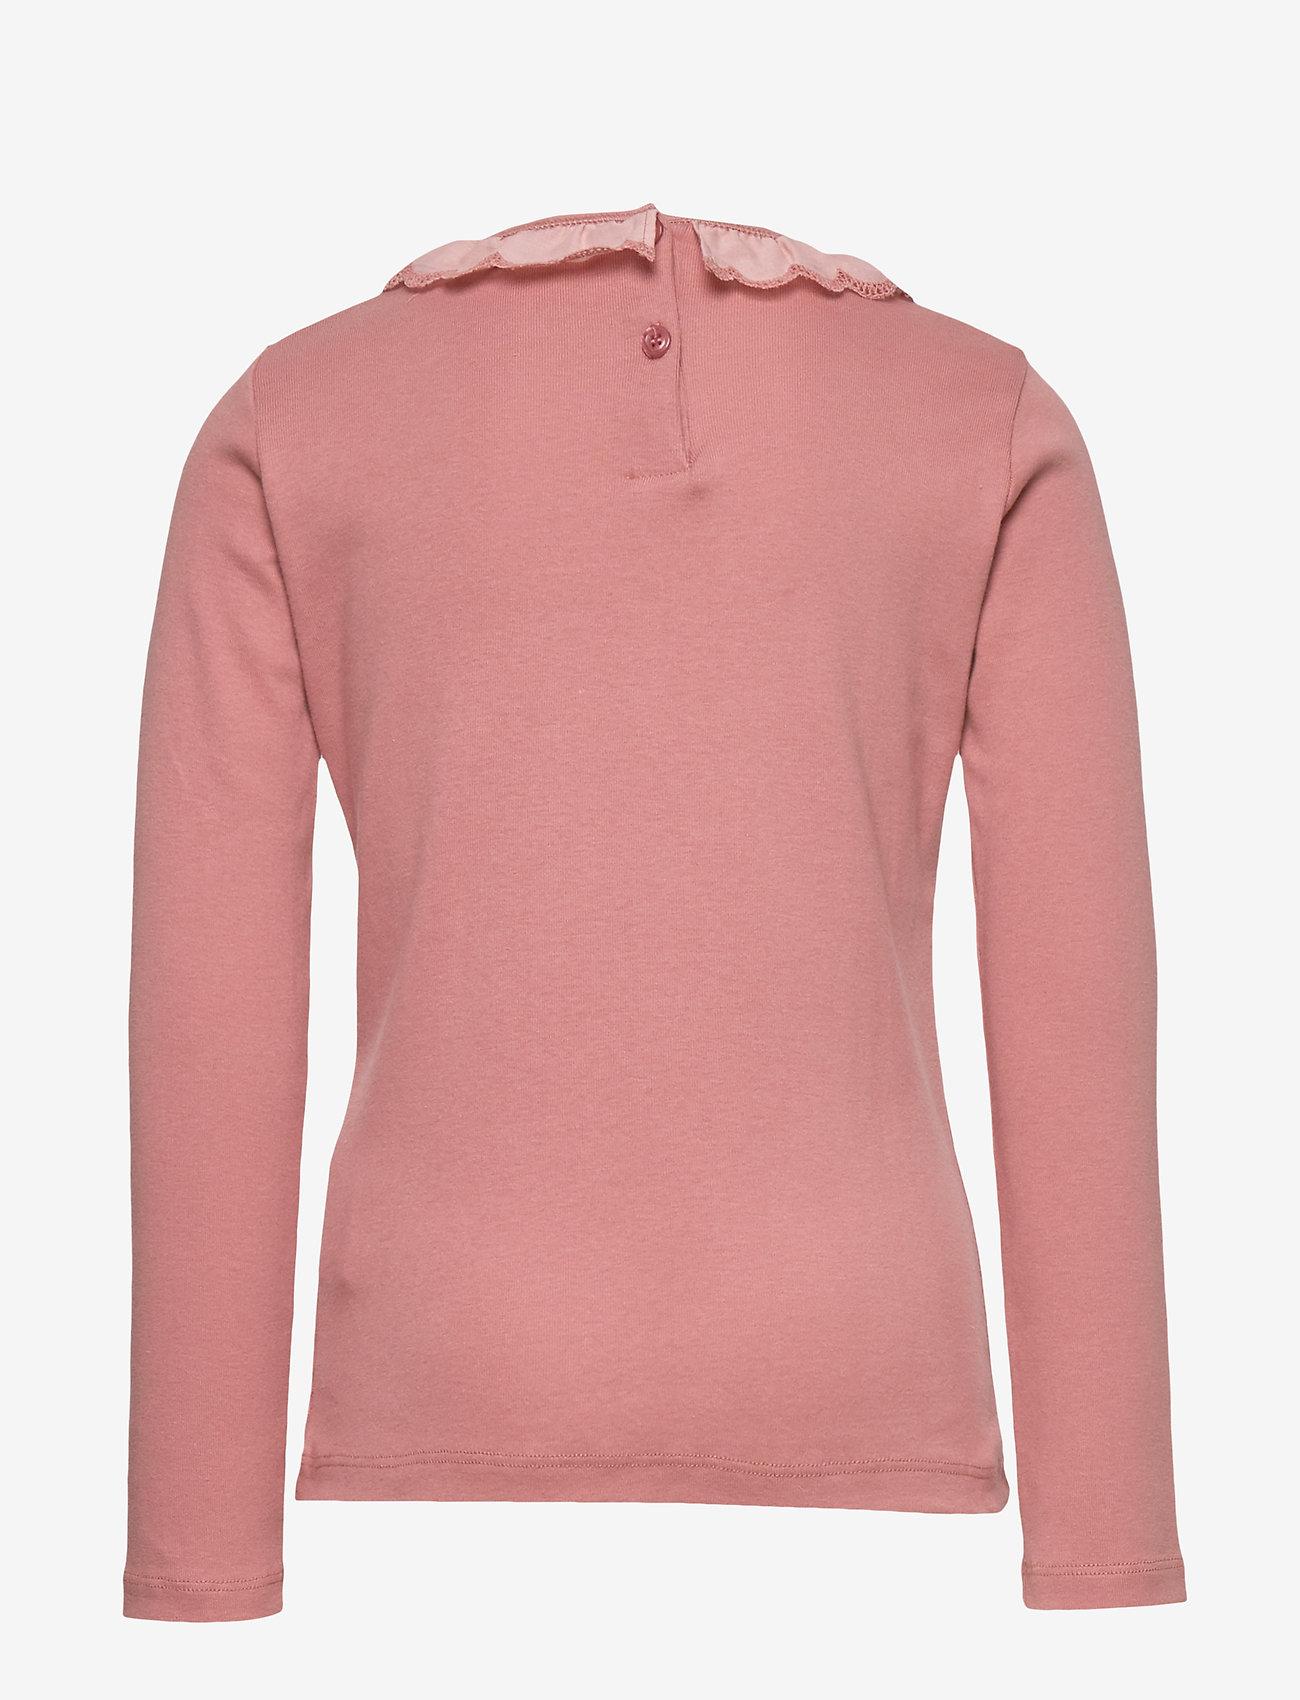 Noa Noa Miniature - T-shirt - long-sleeved t-shirts - dusty rose - 1